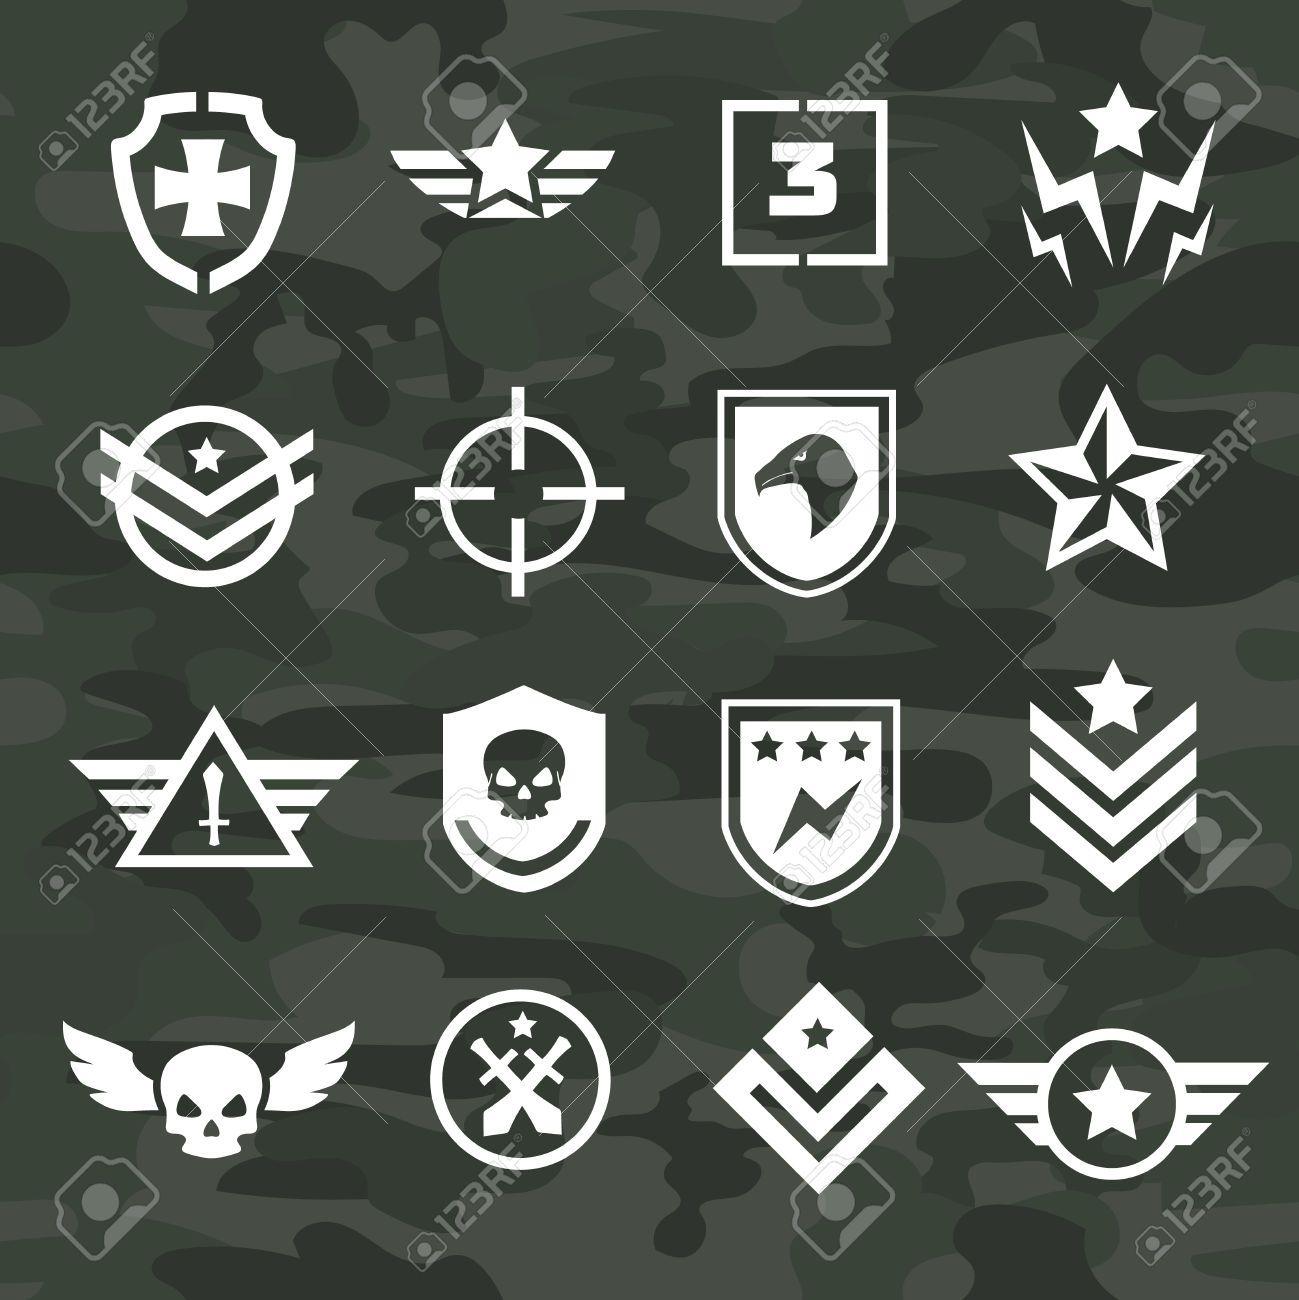 Resultado de imagen para signos militares | Tactical Stuff and ...